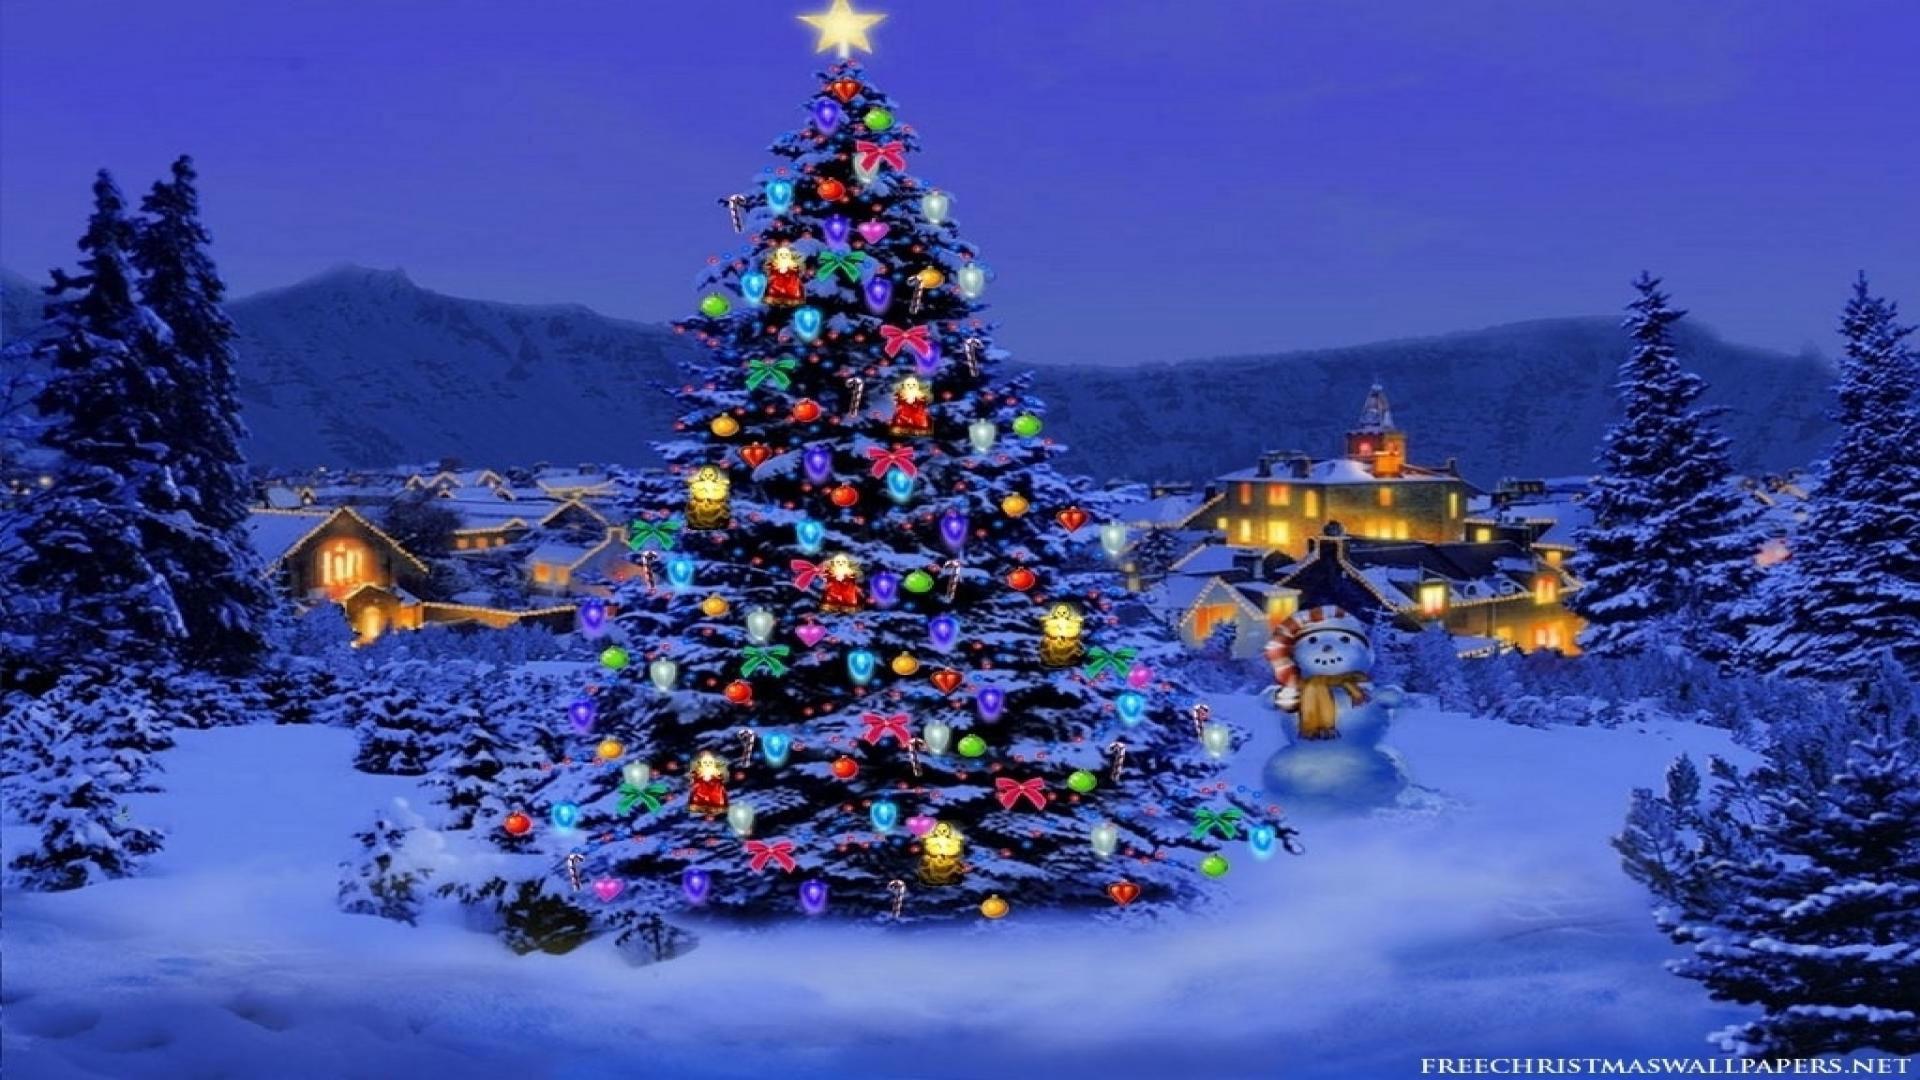 Christmas hd wallpapers 1080p 72 images - Holiday wallpaper hd ...